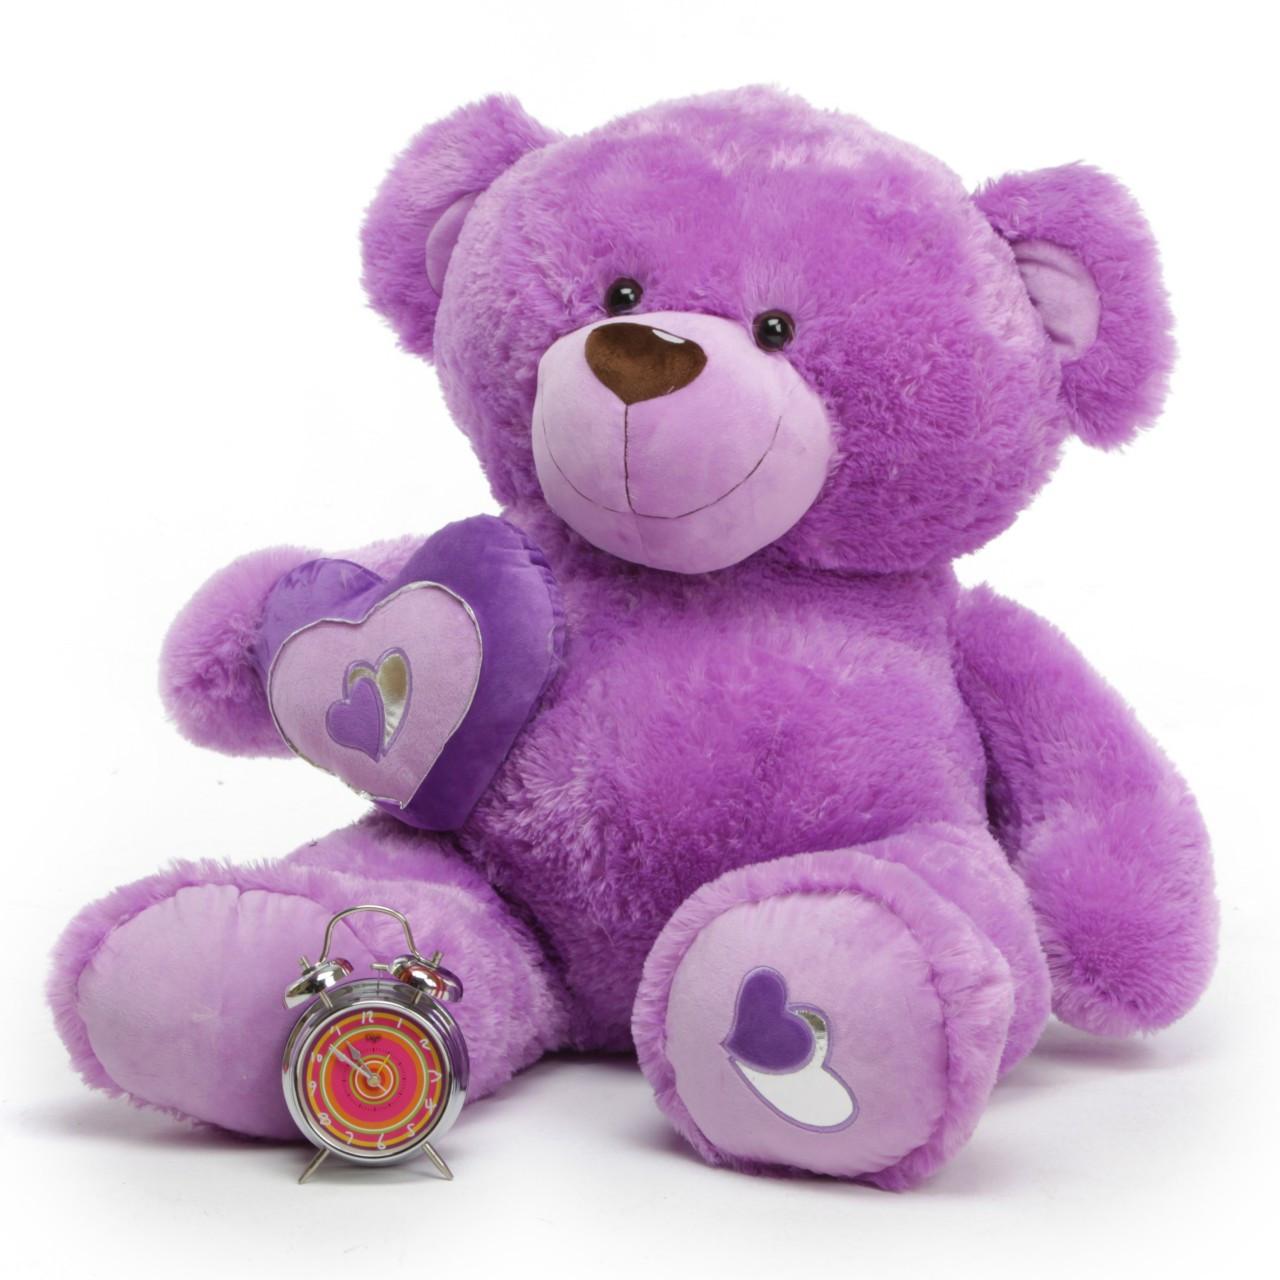 4ft Purple Sewsie Big Love Extra Large Teddy Bear